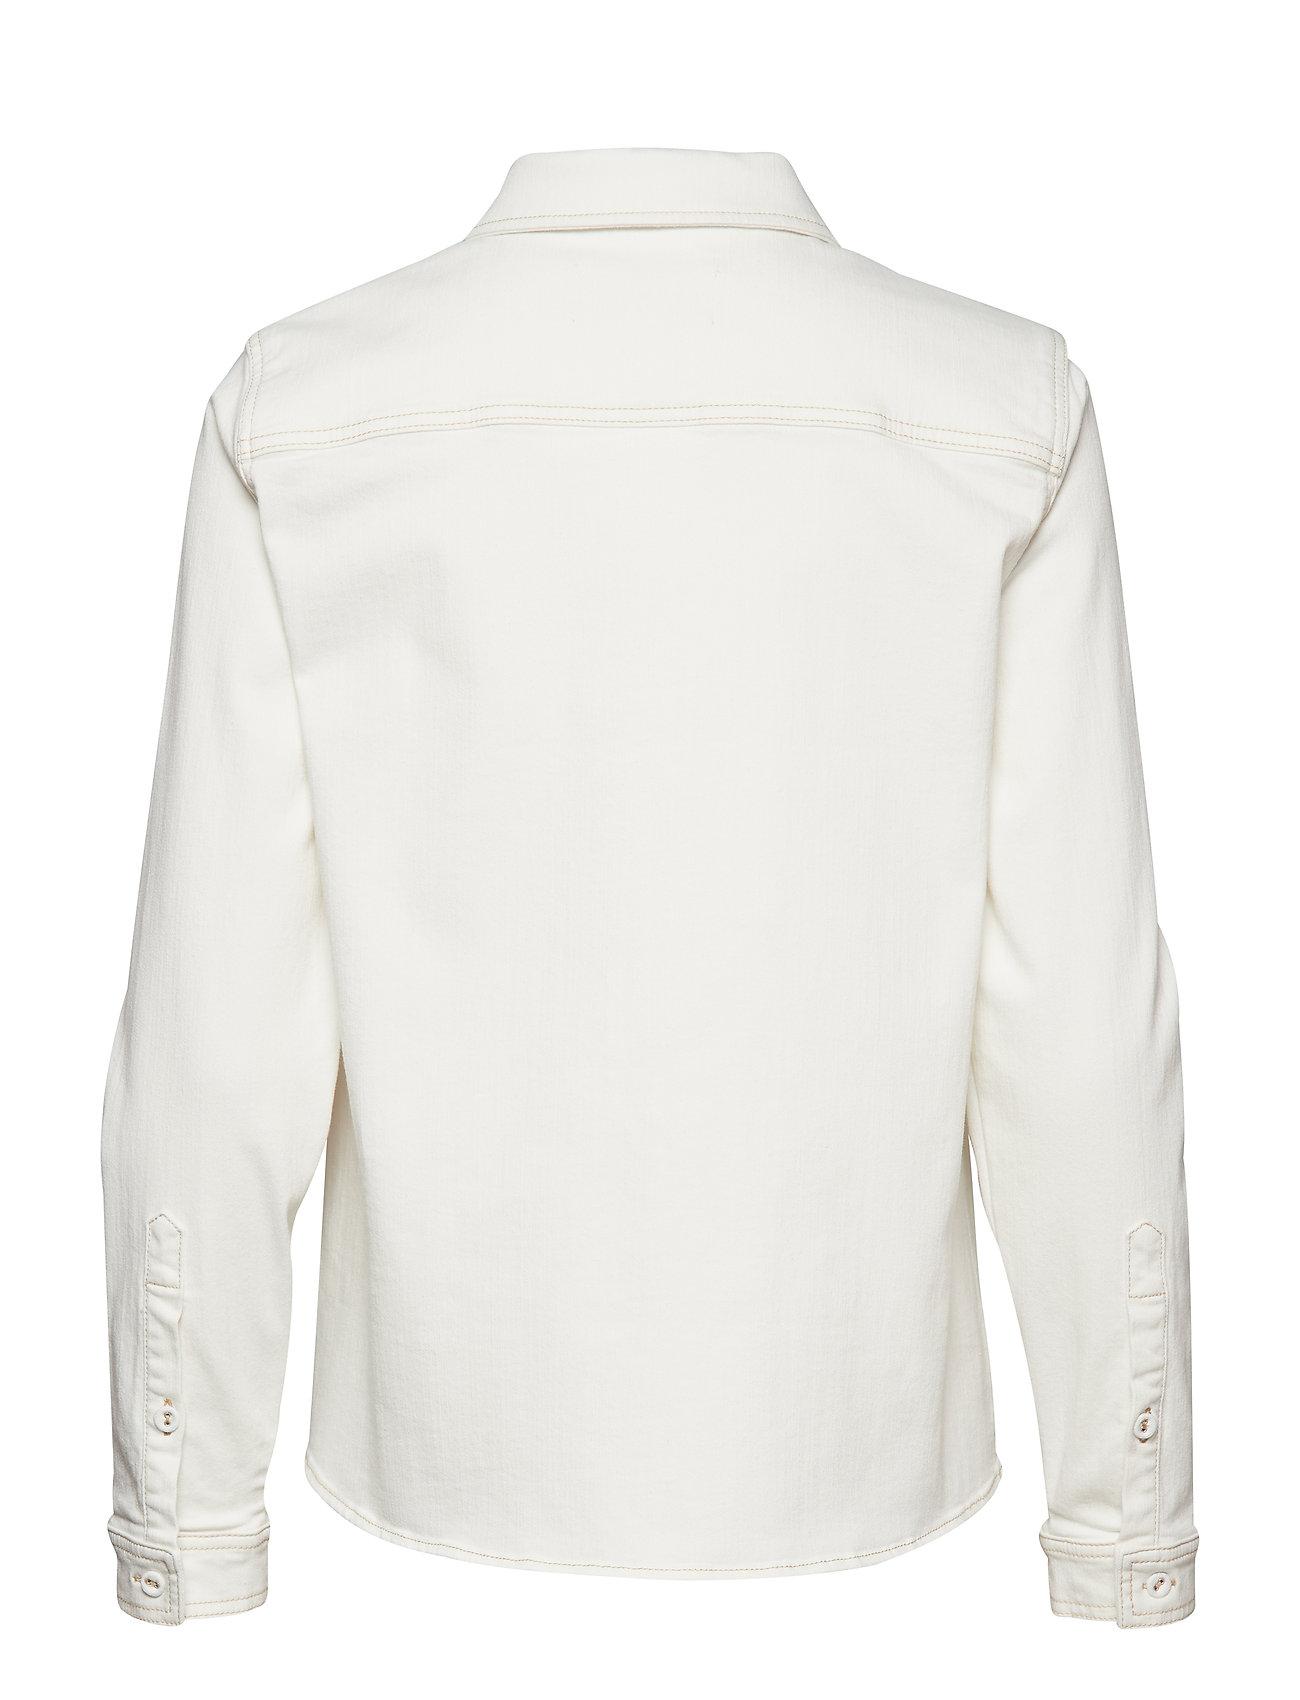 Tomorrow - Bowie Ecru shirt - langärmlige hemden - ecru - 1